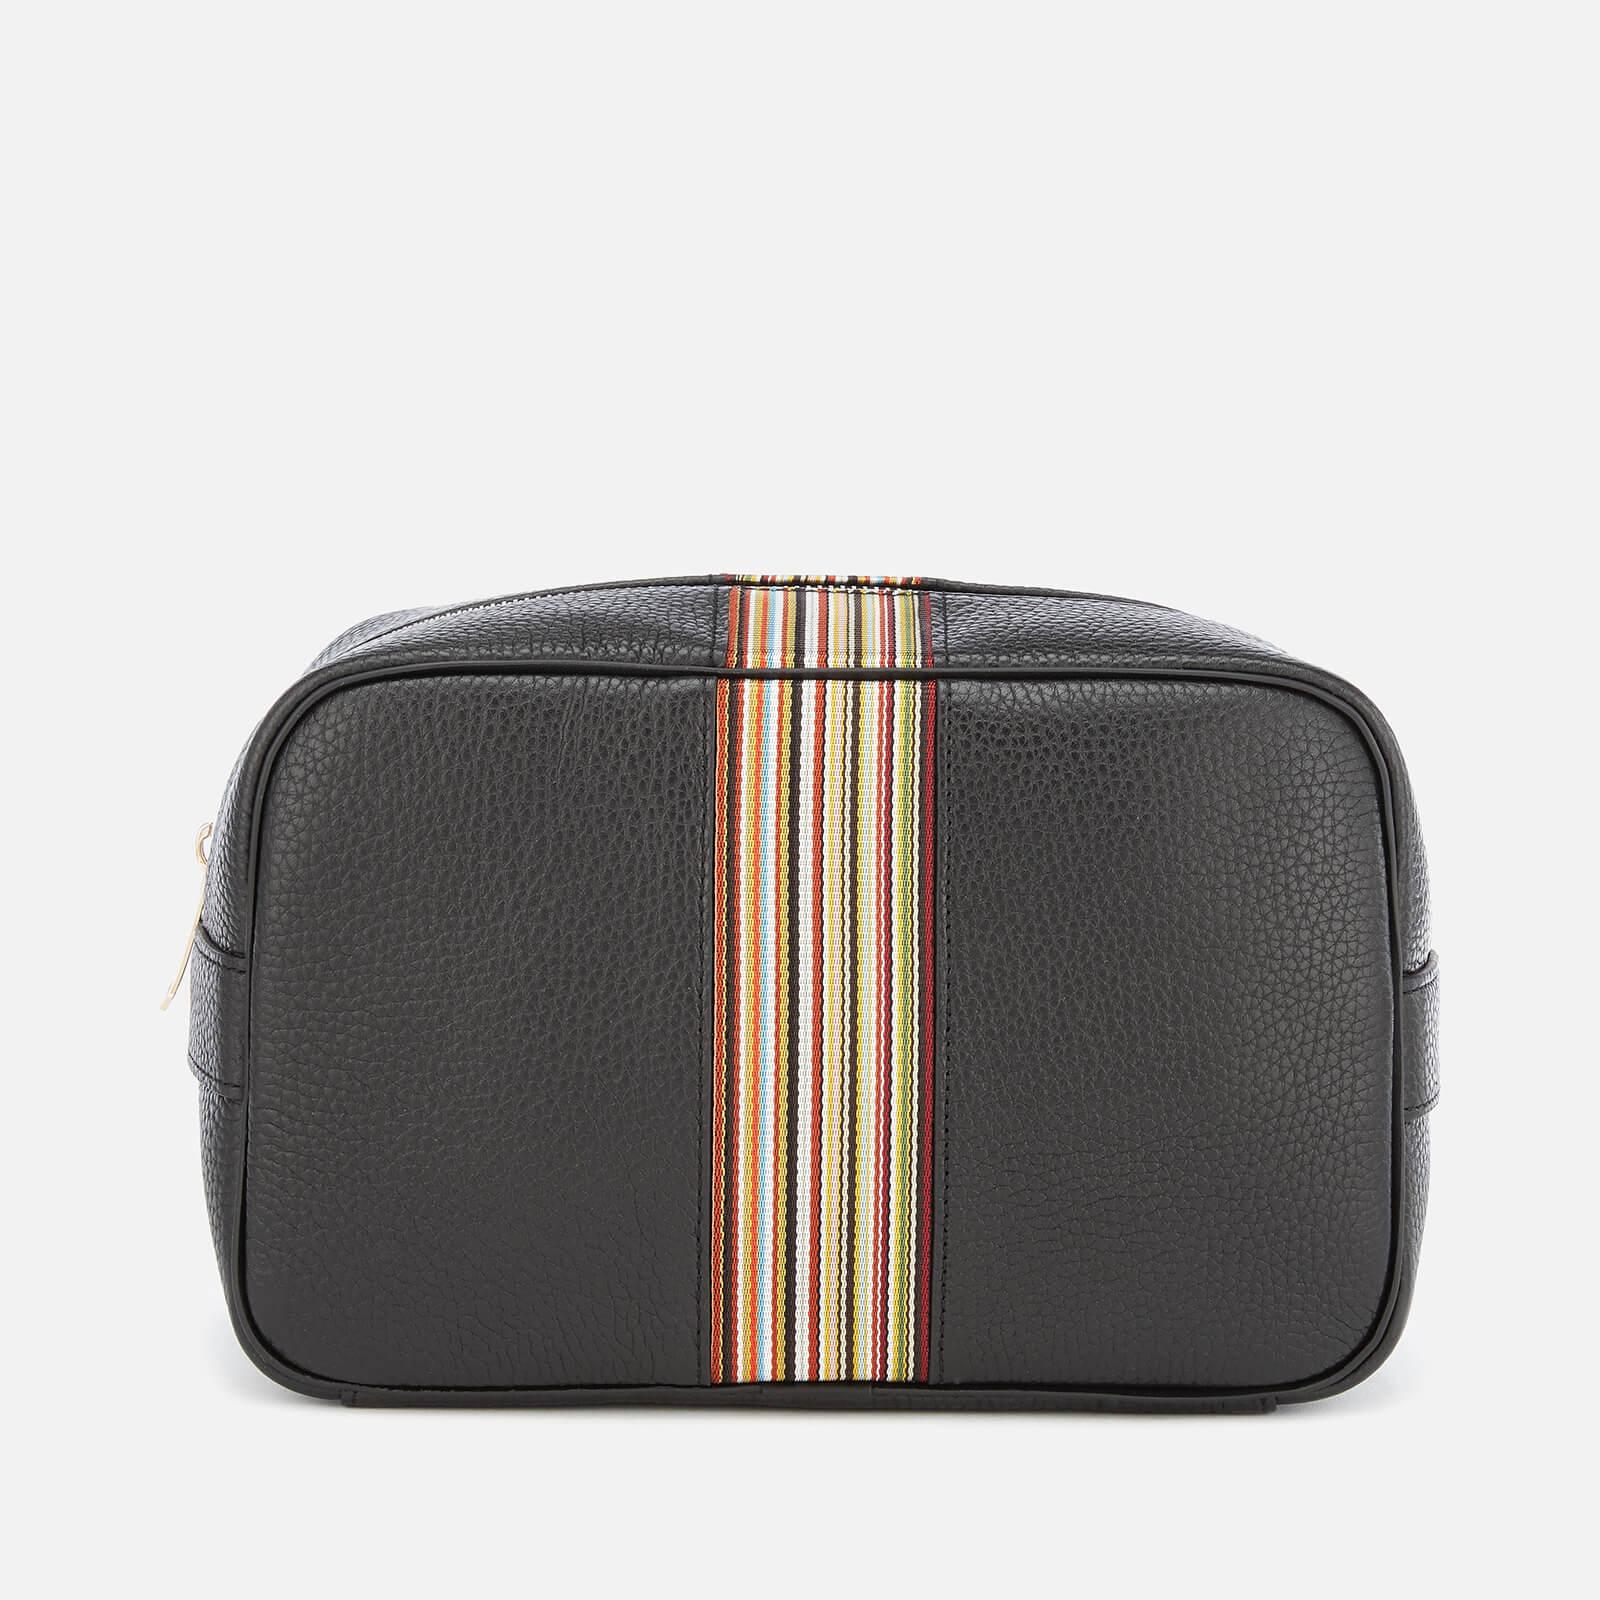 PS Paul Smith Men's Signature Stripe Wash Bag - Black Pebble